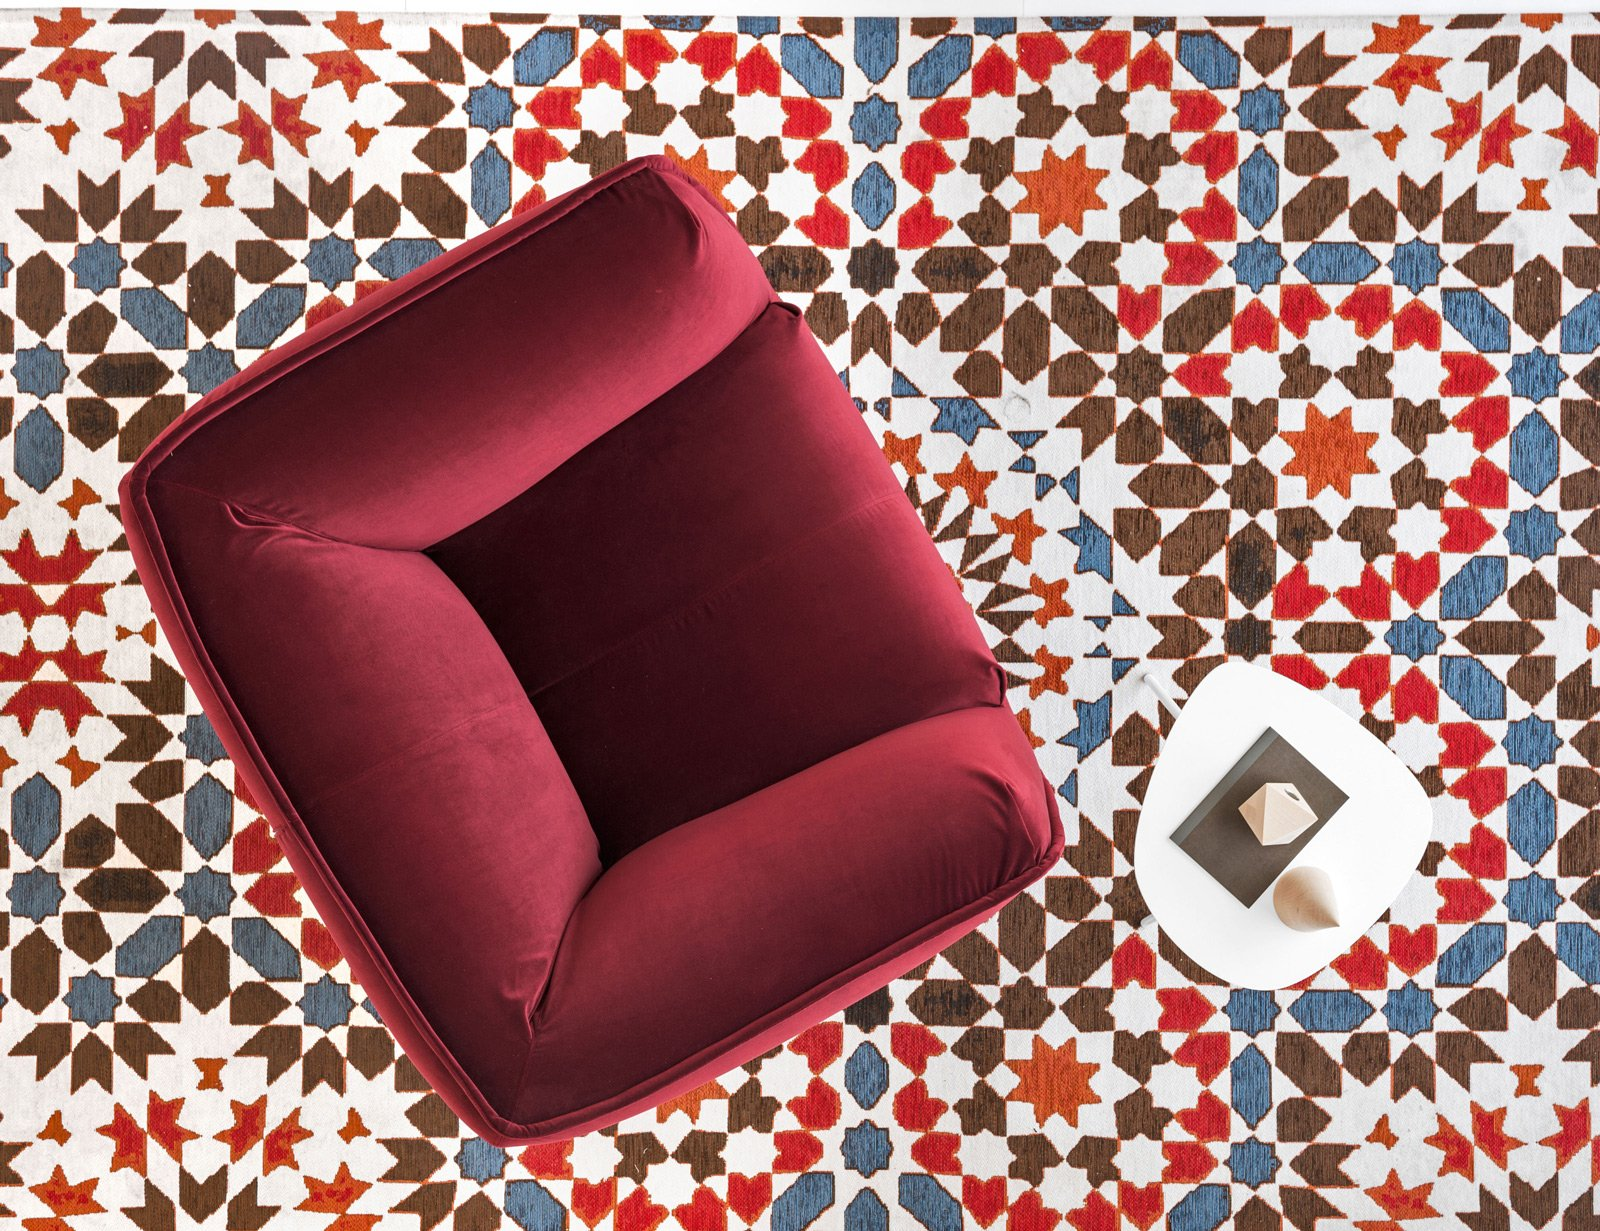 Tappeti moderni colorati o decorativi da 50 a 500 euro - Tappeti colorati ...